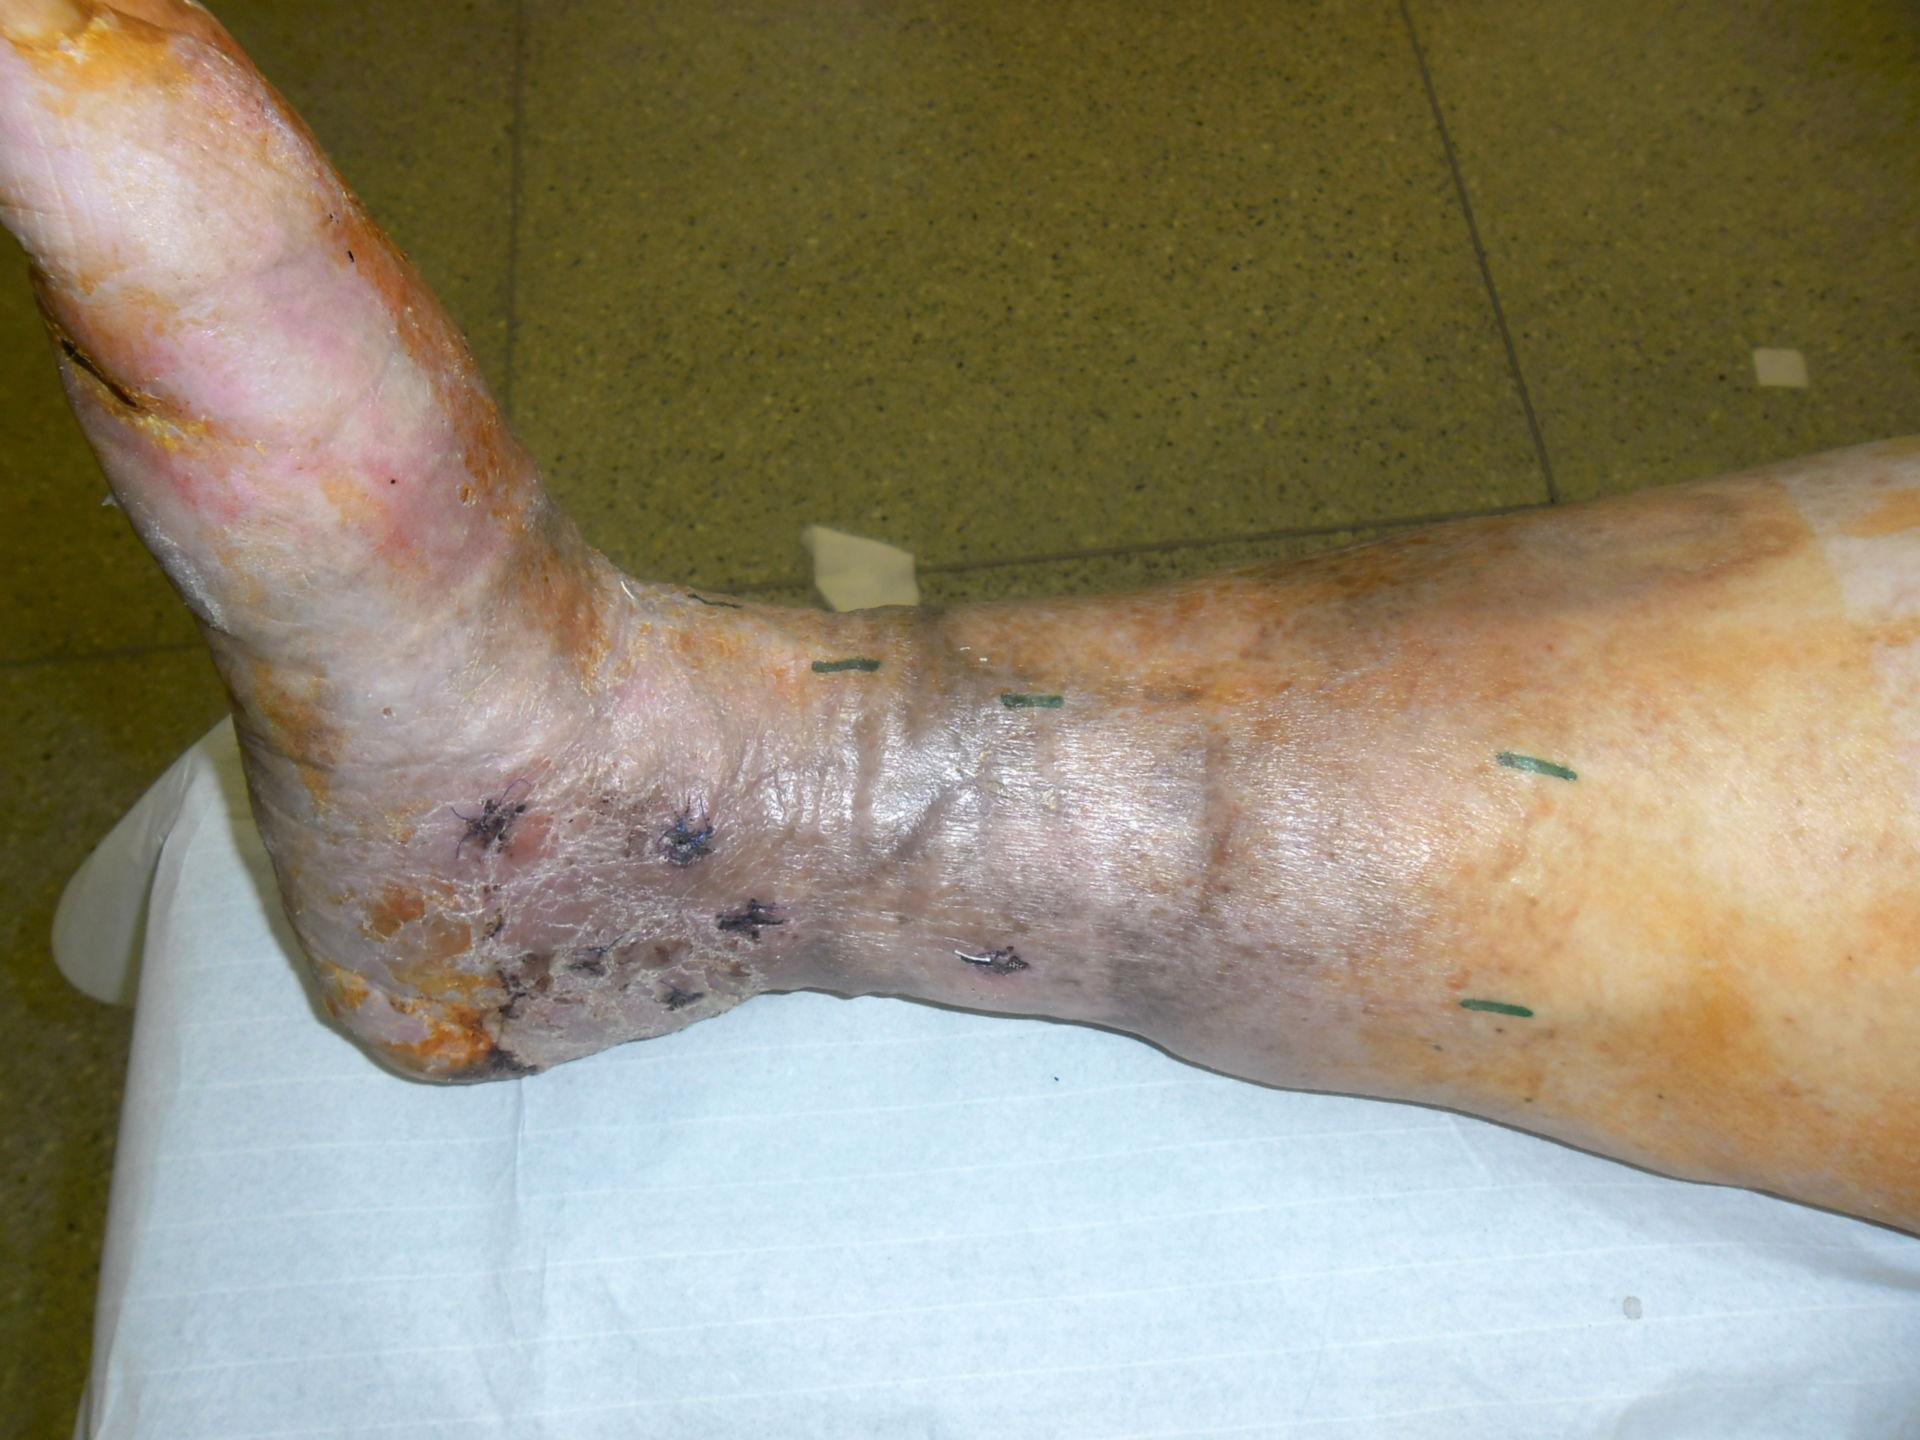 Varicosis - dermatitis congestiva